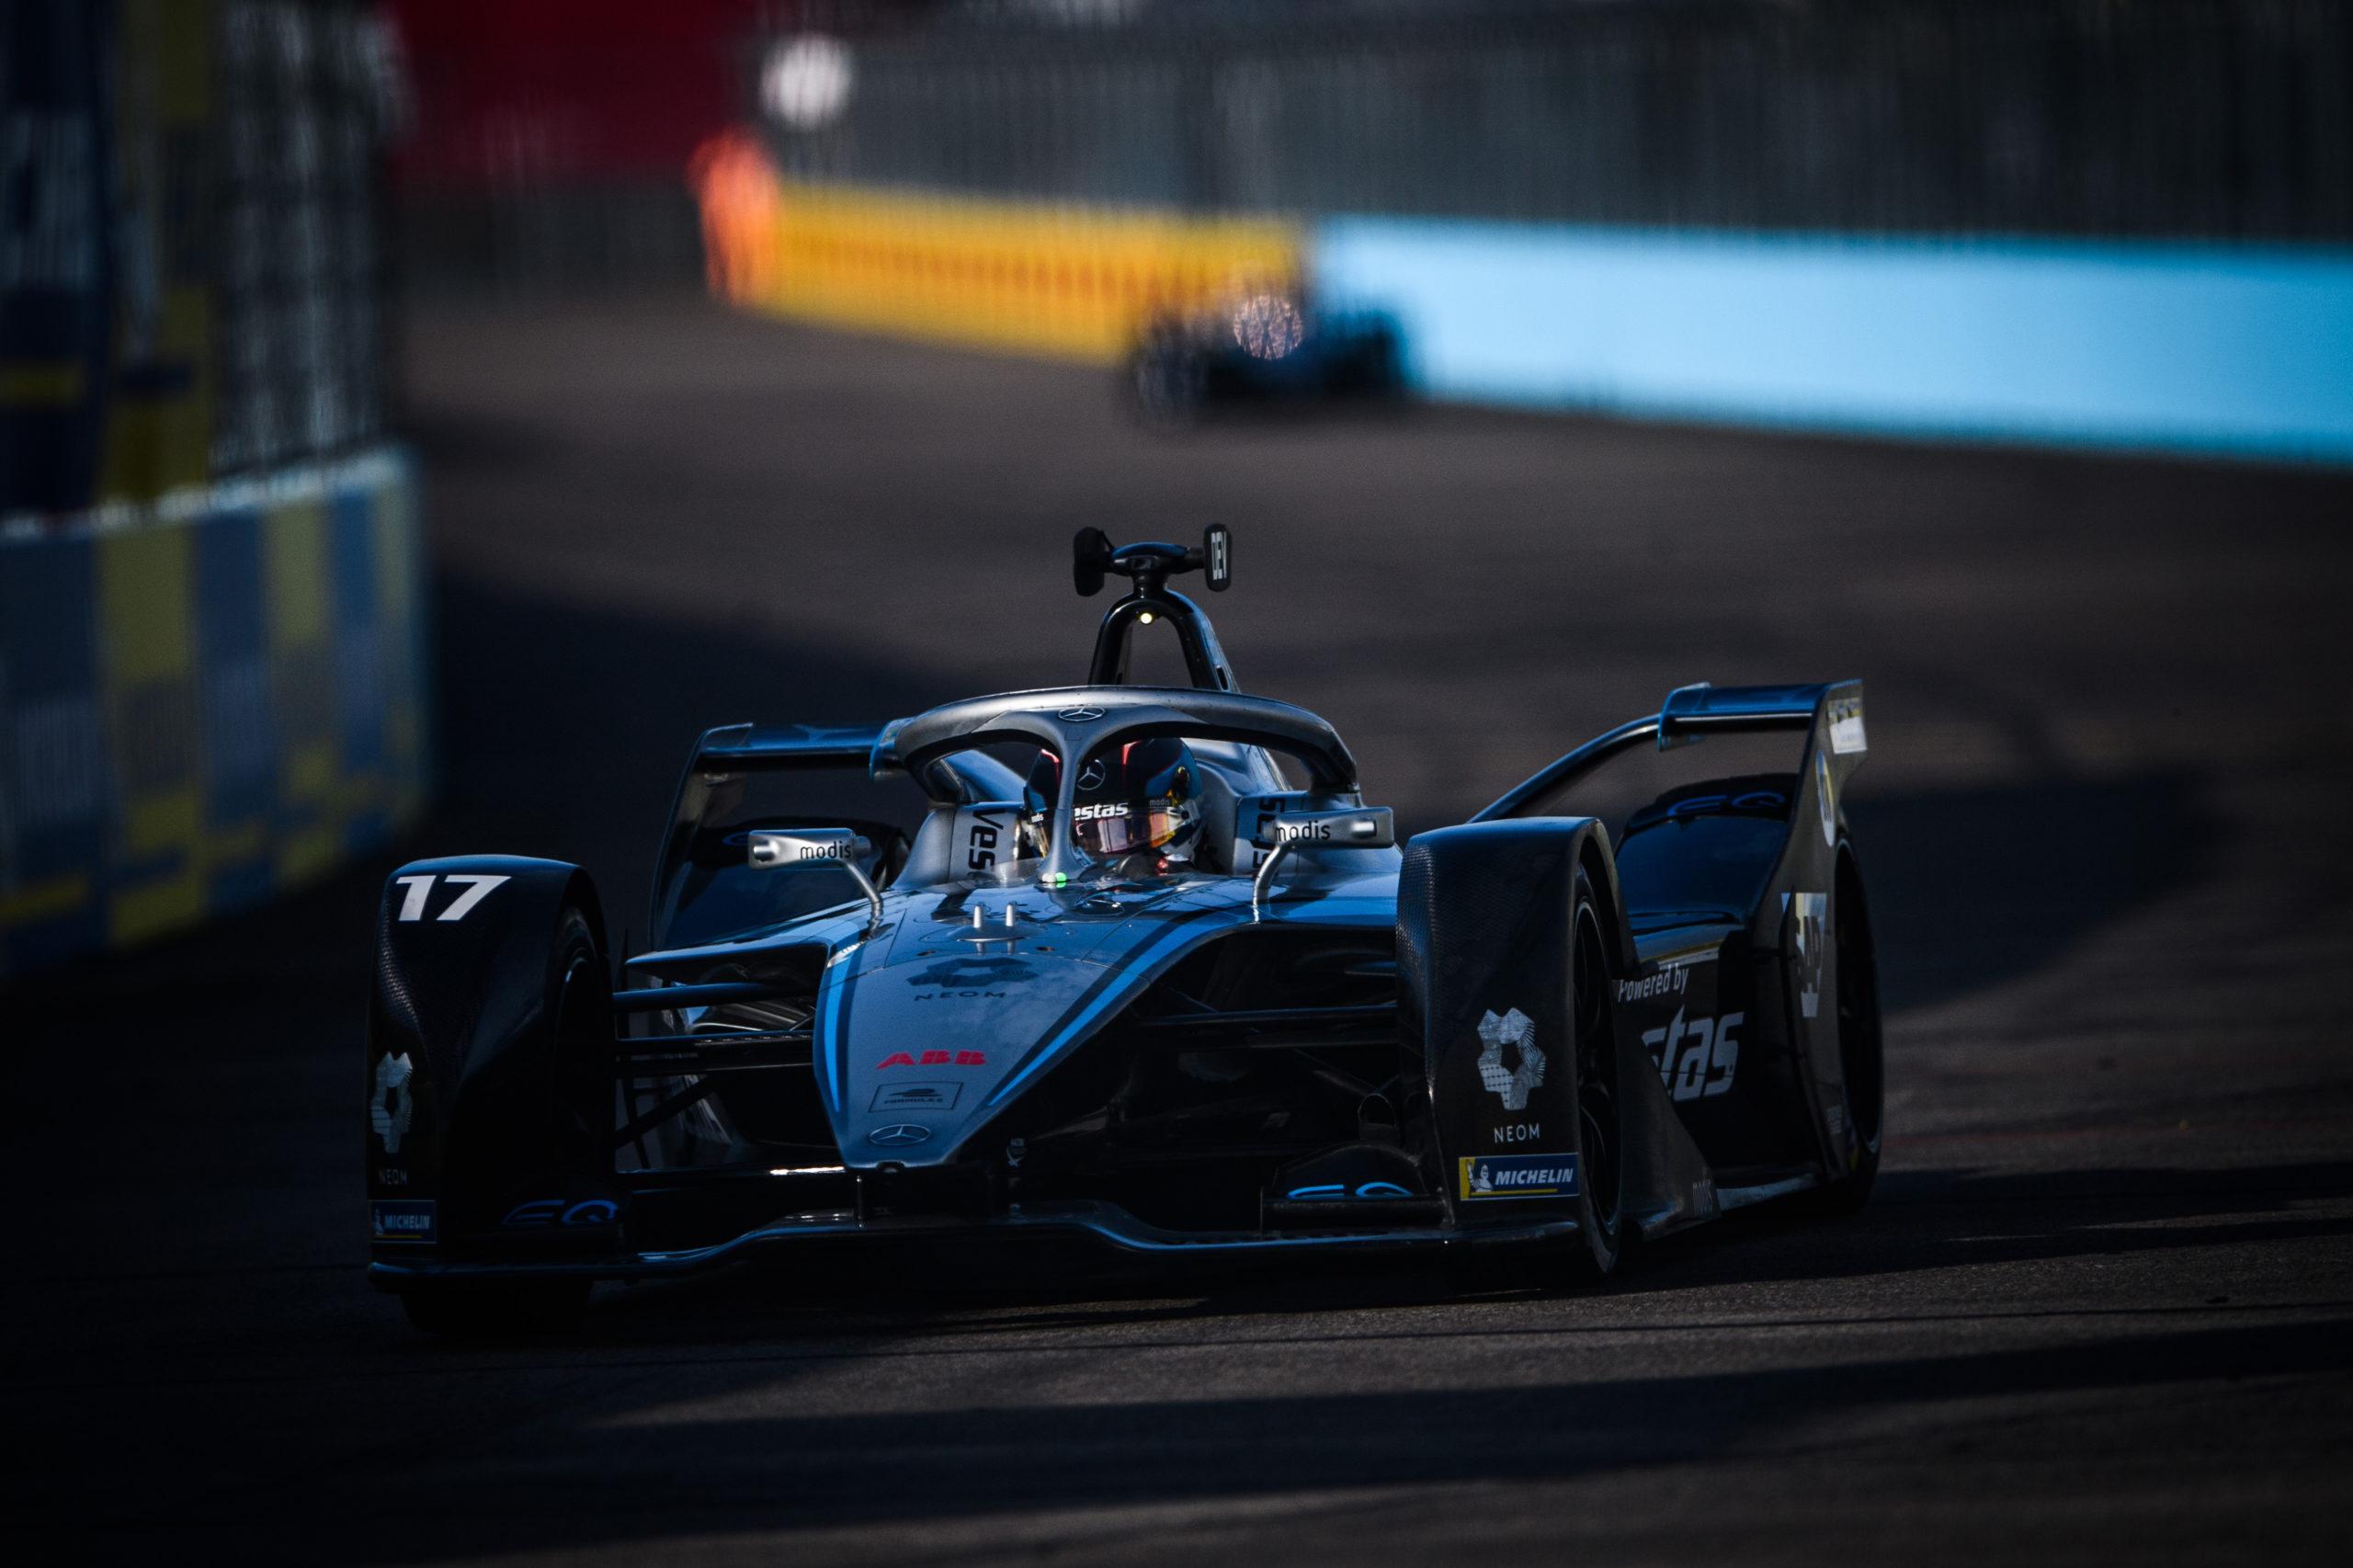 Formel E – Mercedes-Benz EQ Formel E Team, Berlin E-Prix 2021. Nyck de Vries   Formula E - Mercedes-Benz EQ Formula E Team, Berlin E-Prix 2021. Nyck de Vries